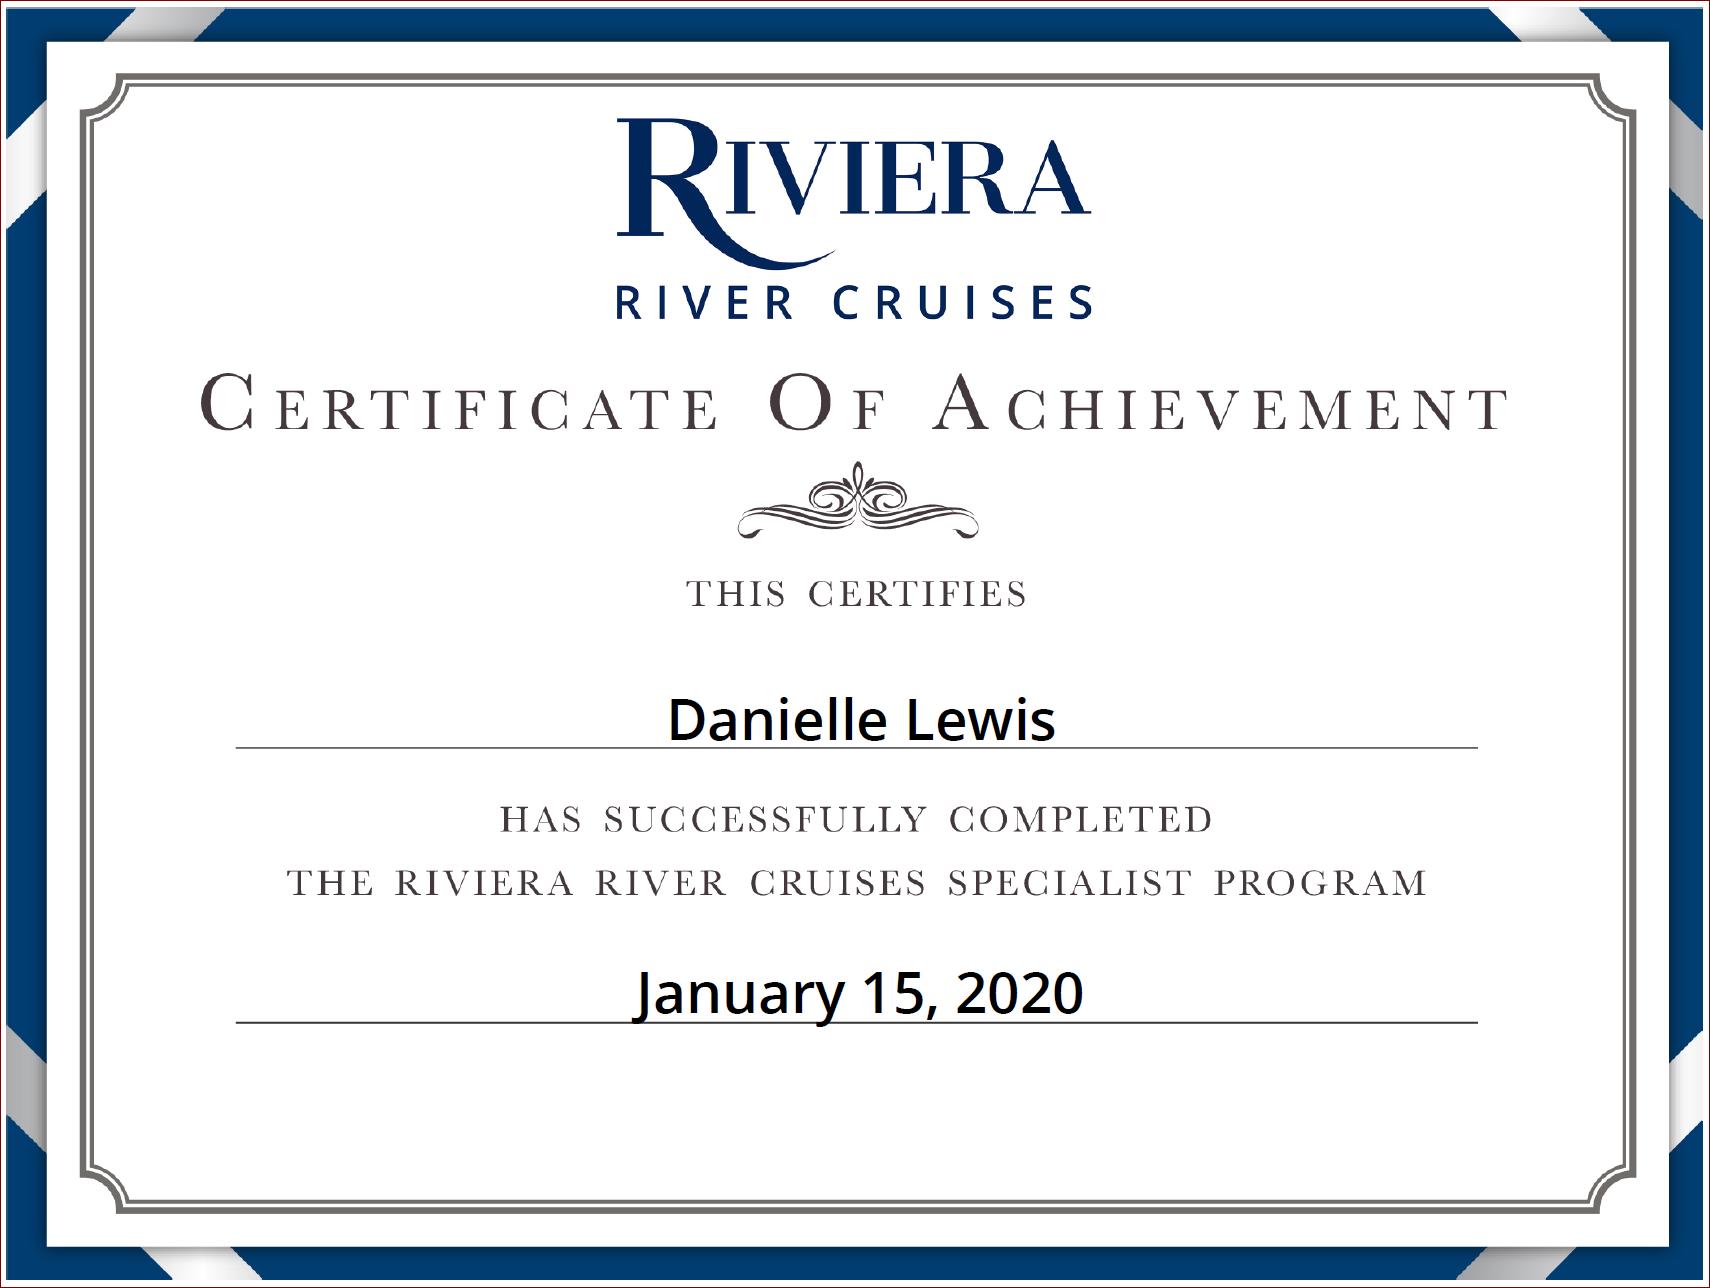 SelfishMe Travel - Riviera River Cruises Specialist Certificate of Achievement